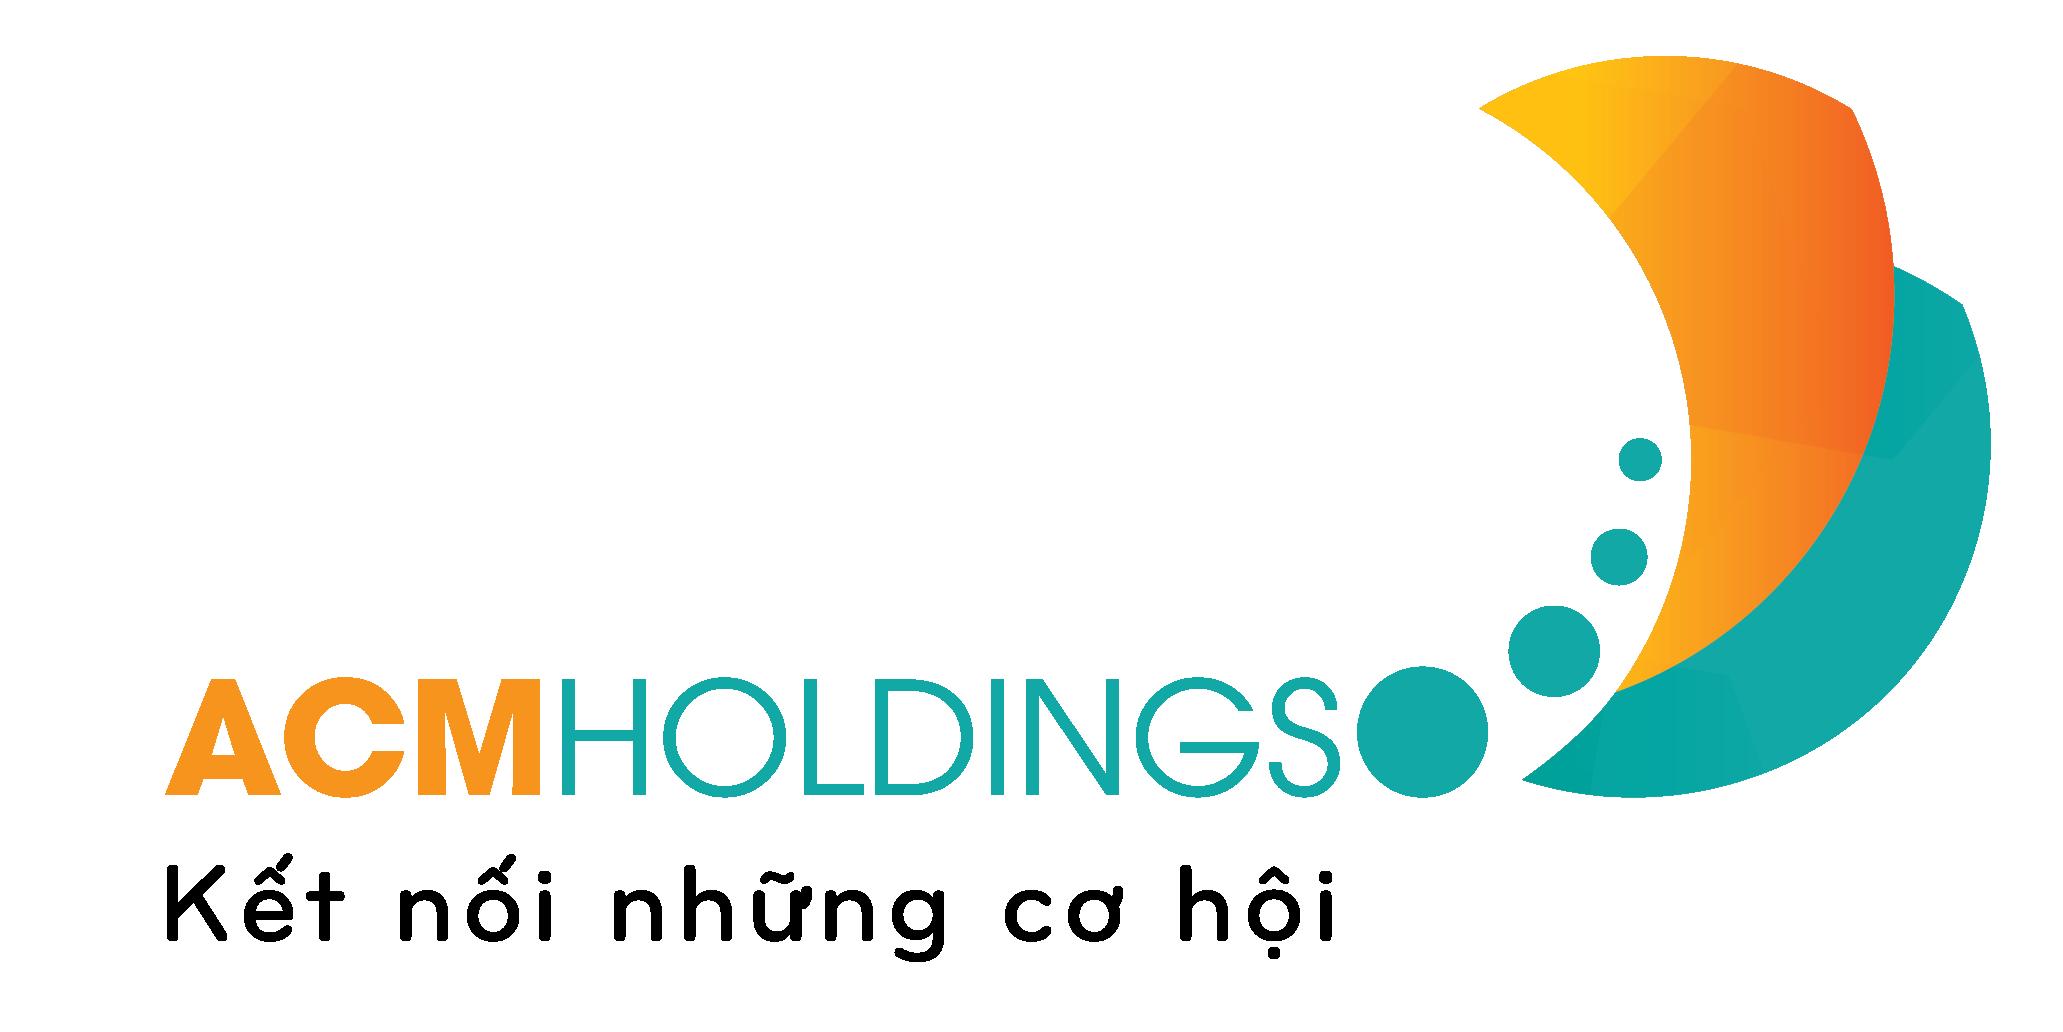 ACM Holdings